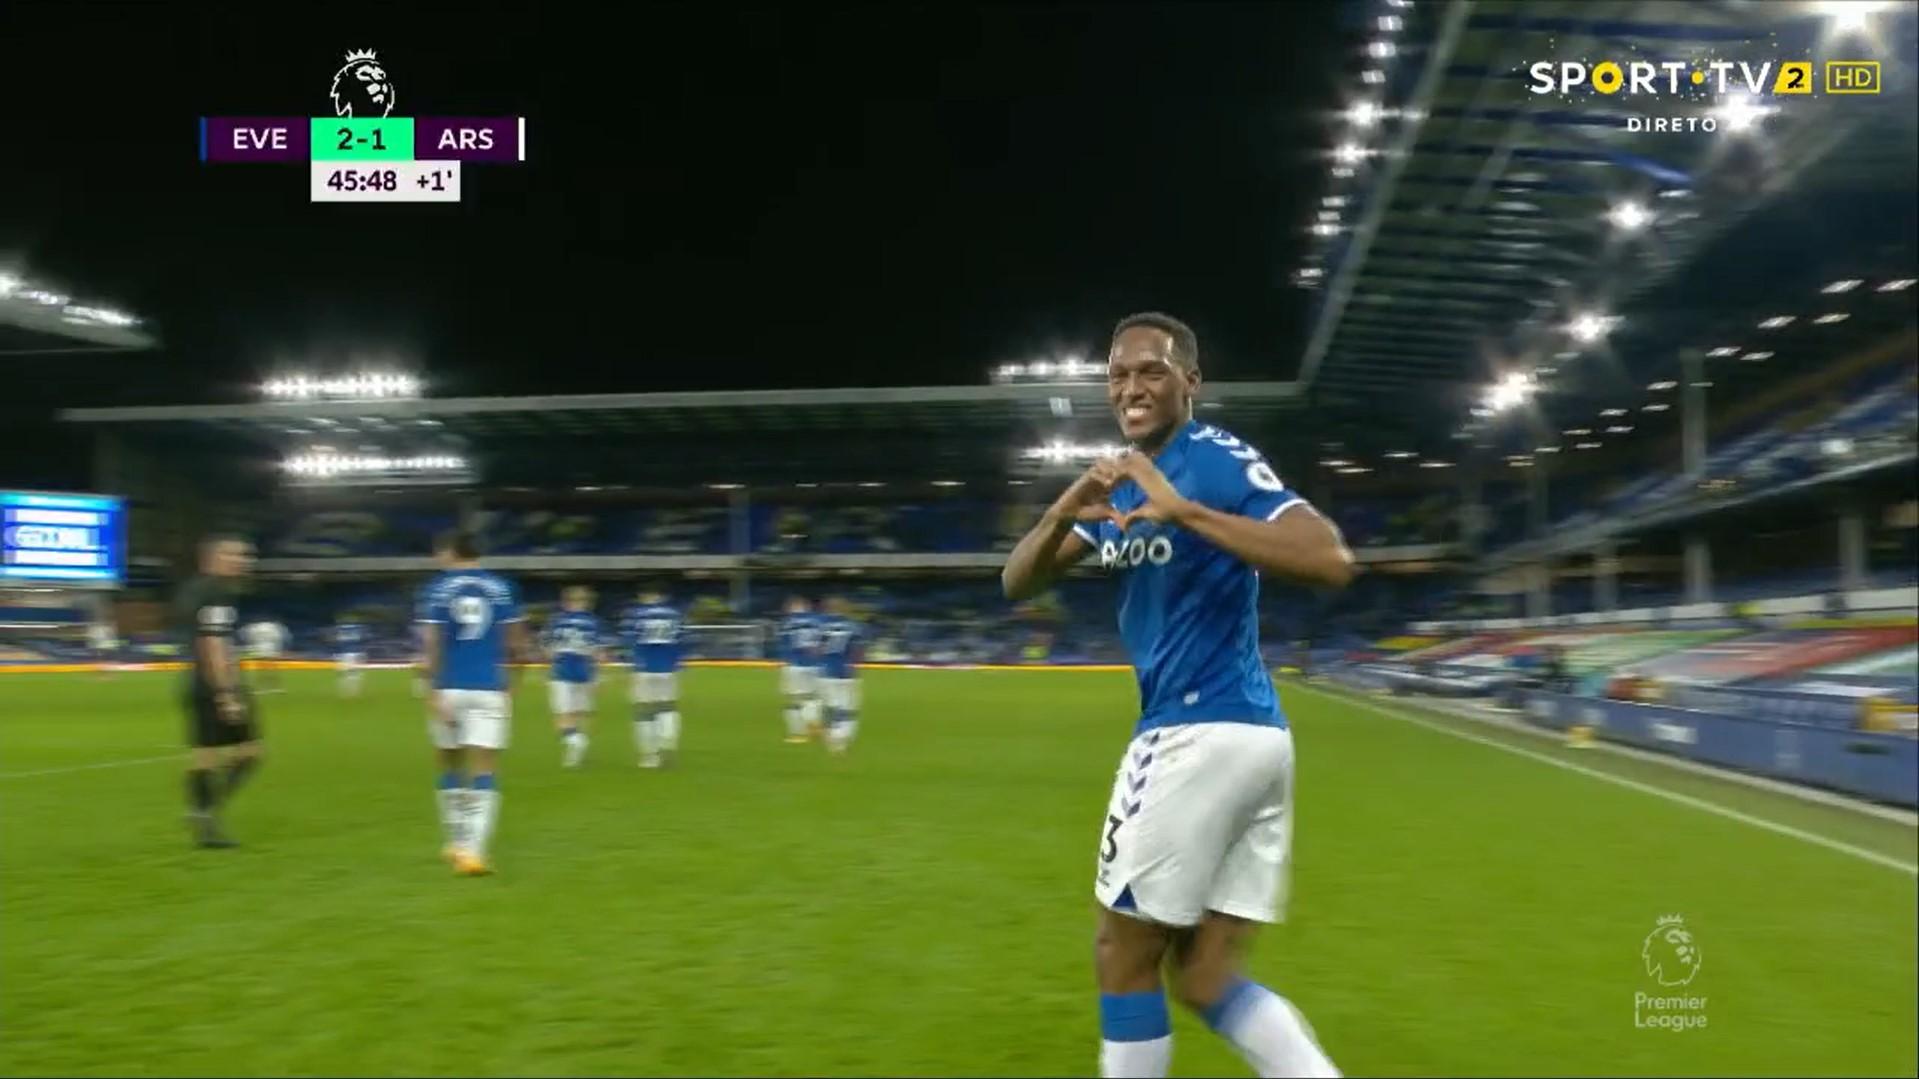 Premier League (14ª Jornada): Resumo Everton 2-1 Arsenal